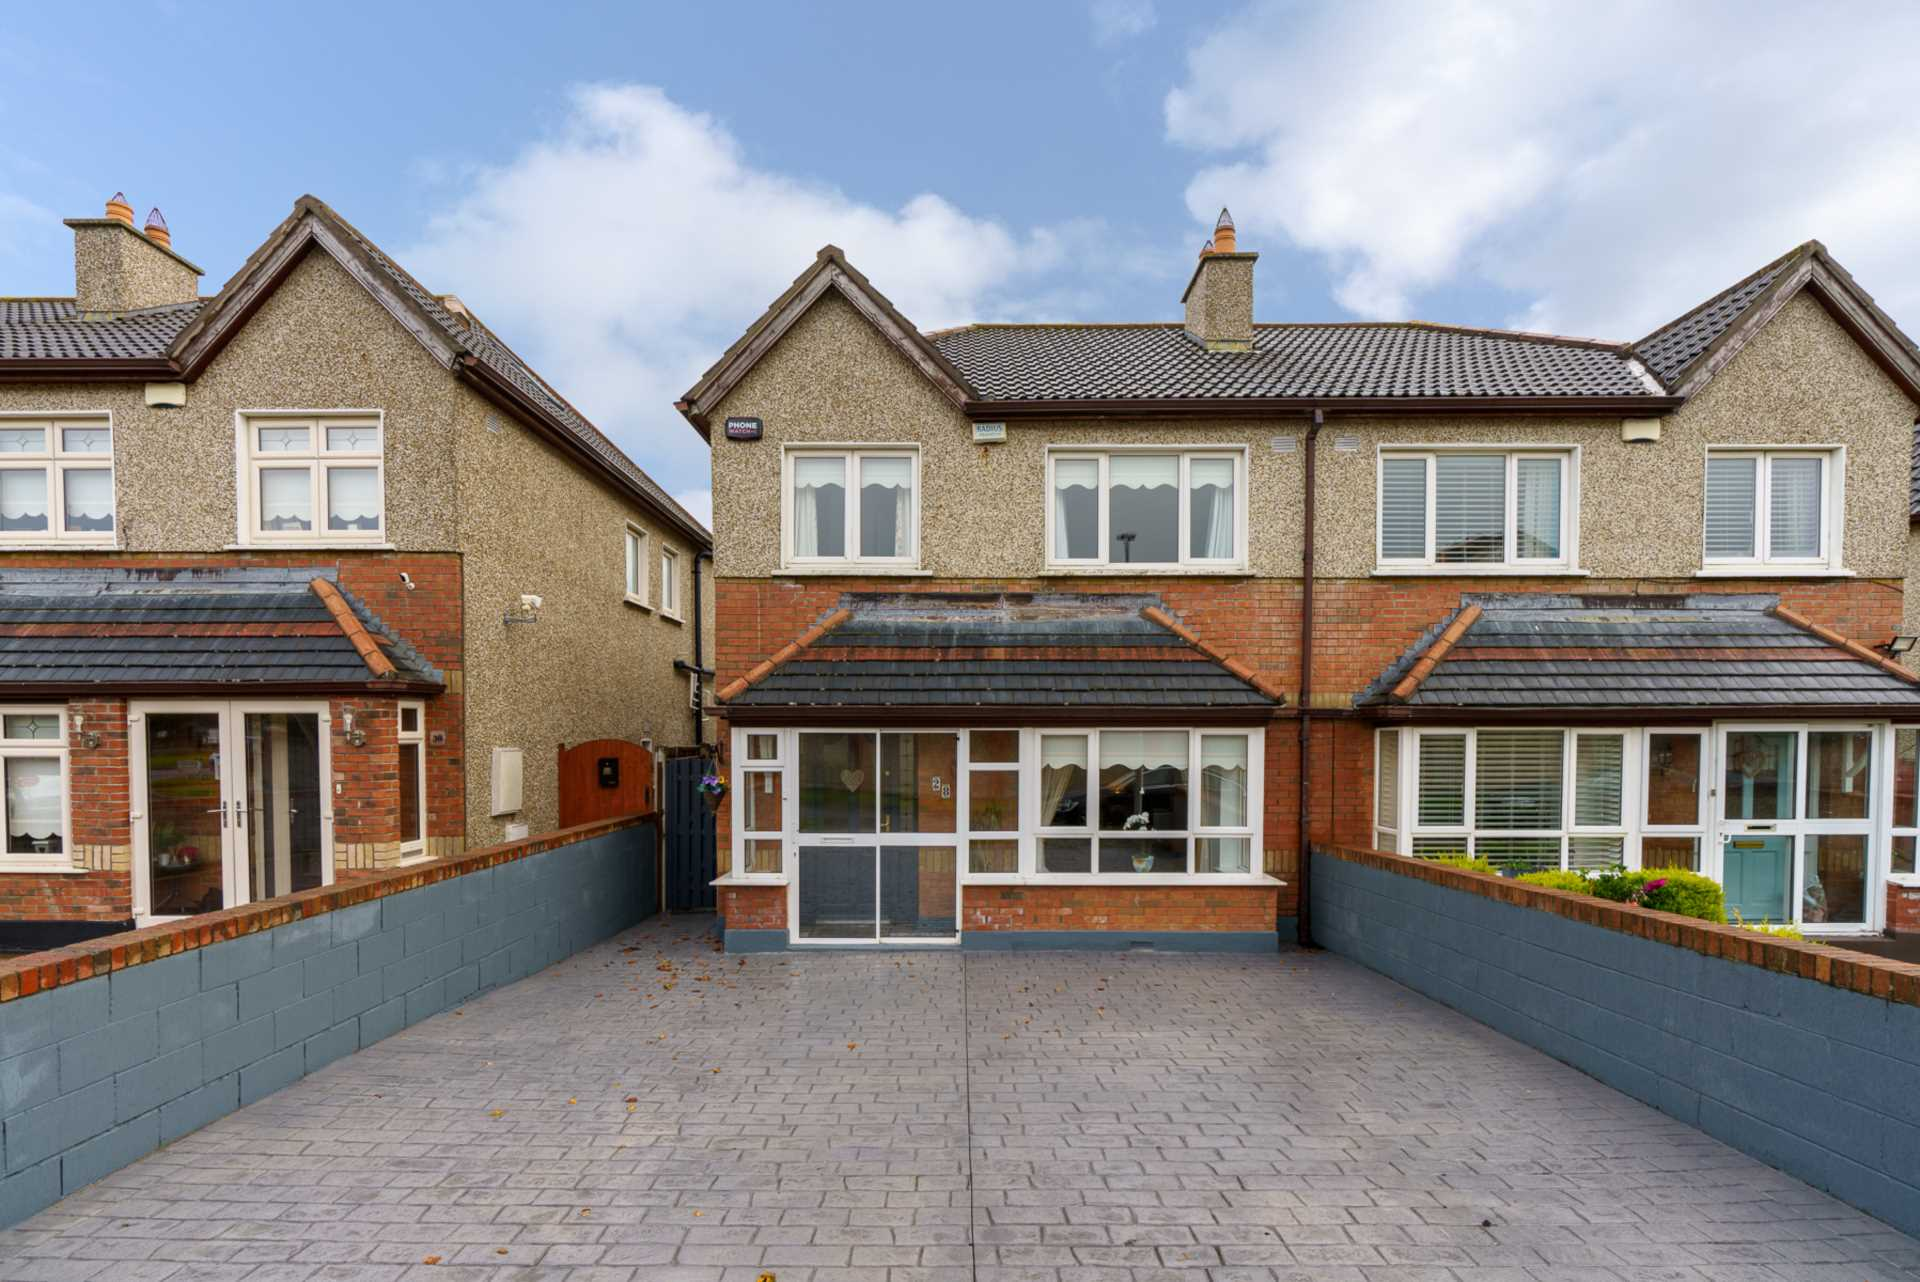 28 Ellensborough Meadows, Kiltipper Road, Tallaght, Dublin 24, Image 1